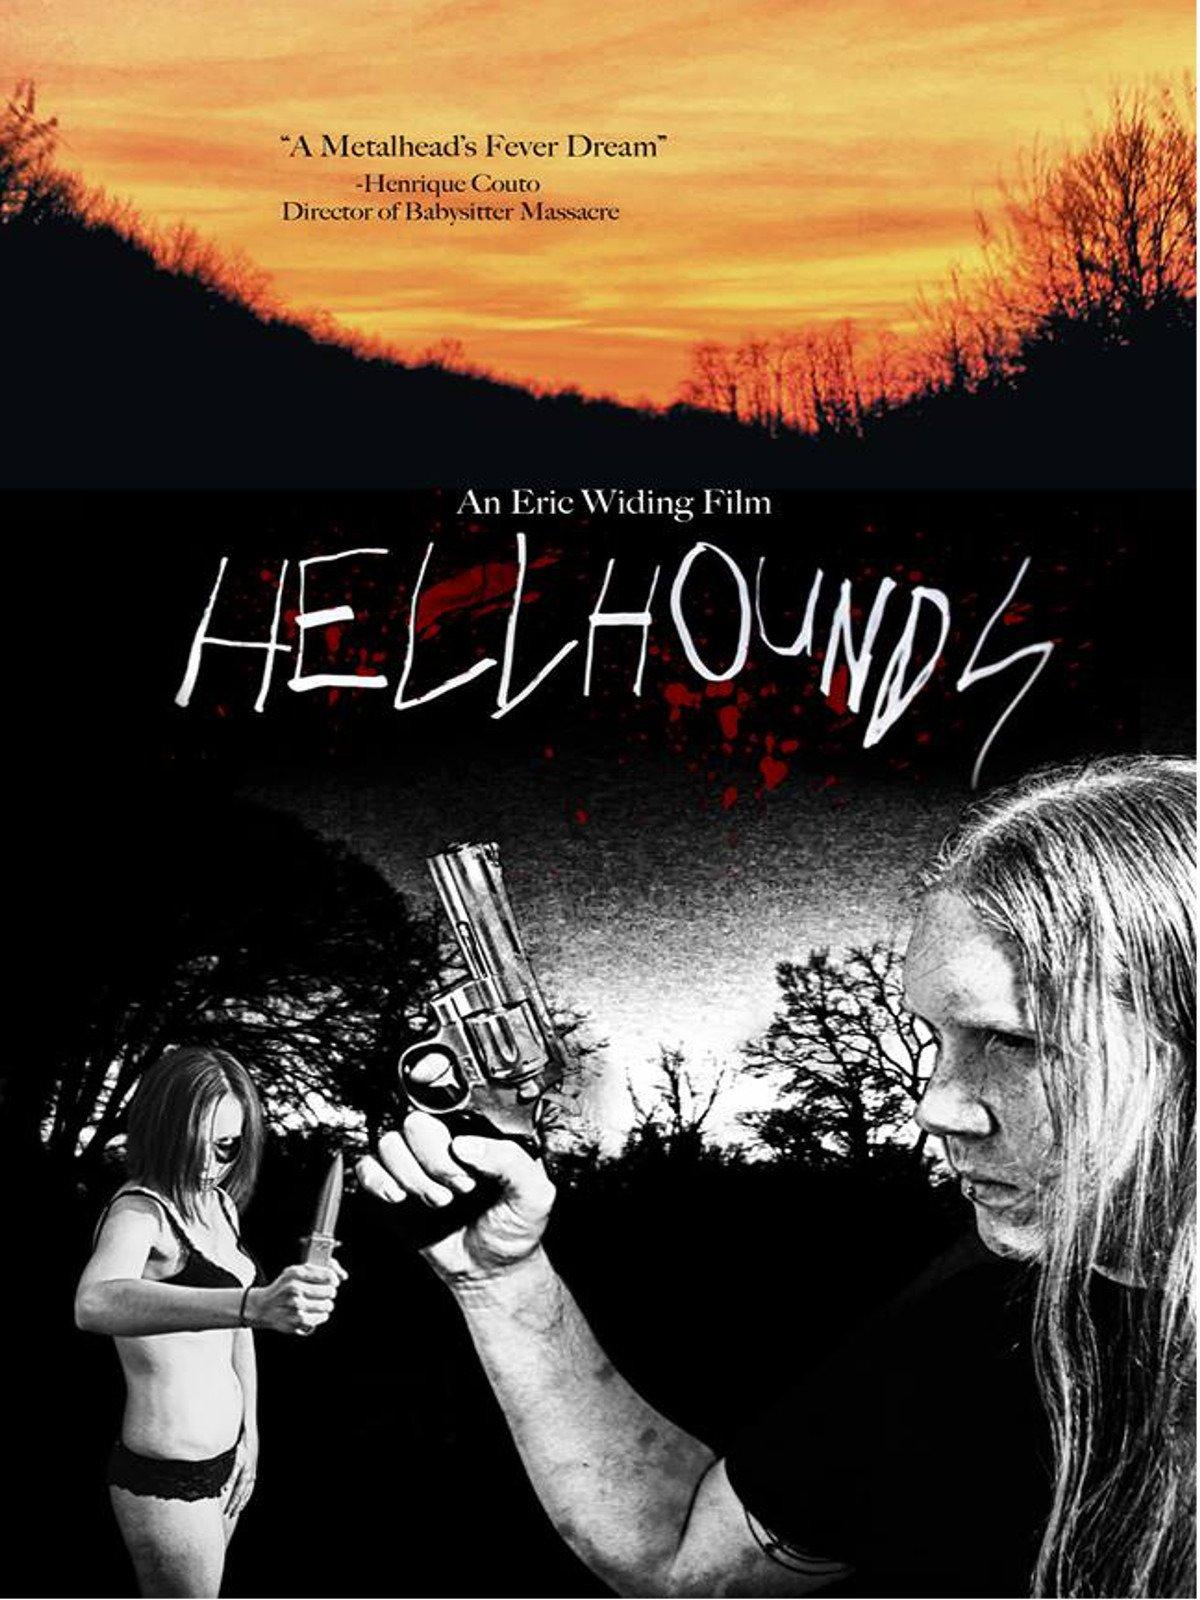 Watch Hellhounds | Prime Video